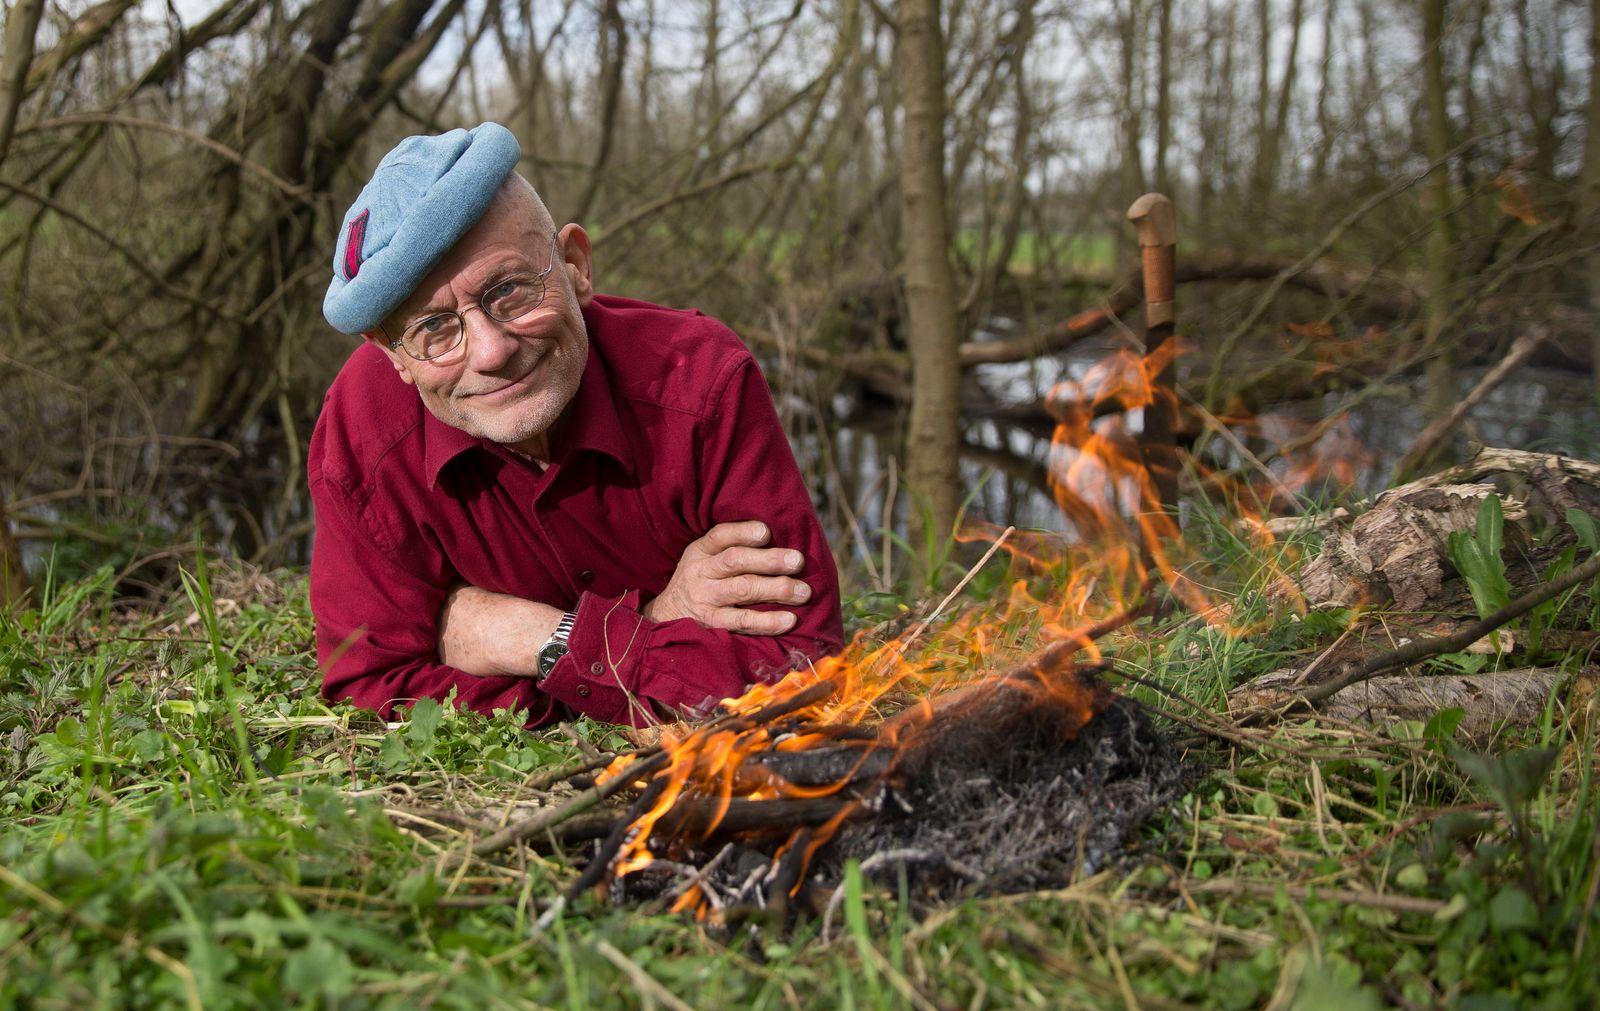 Rüdiger Nehberg feiert 80. Geburtstag